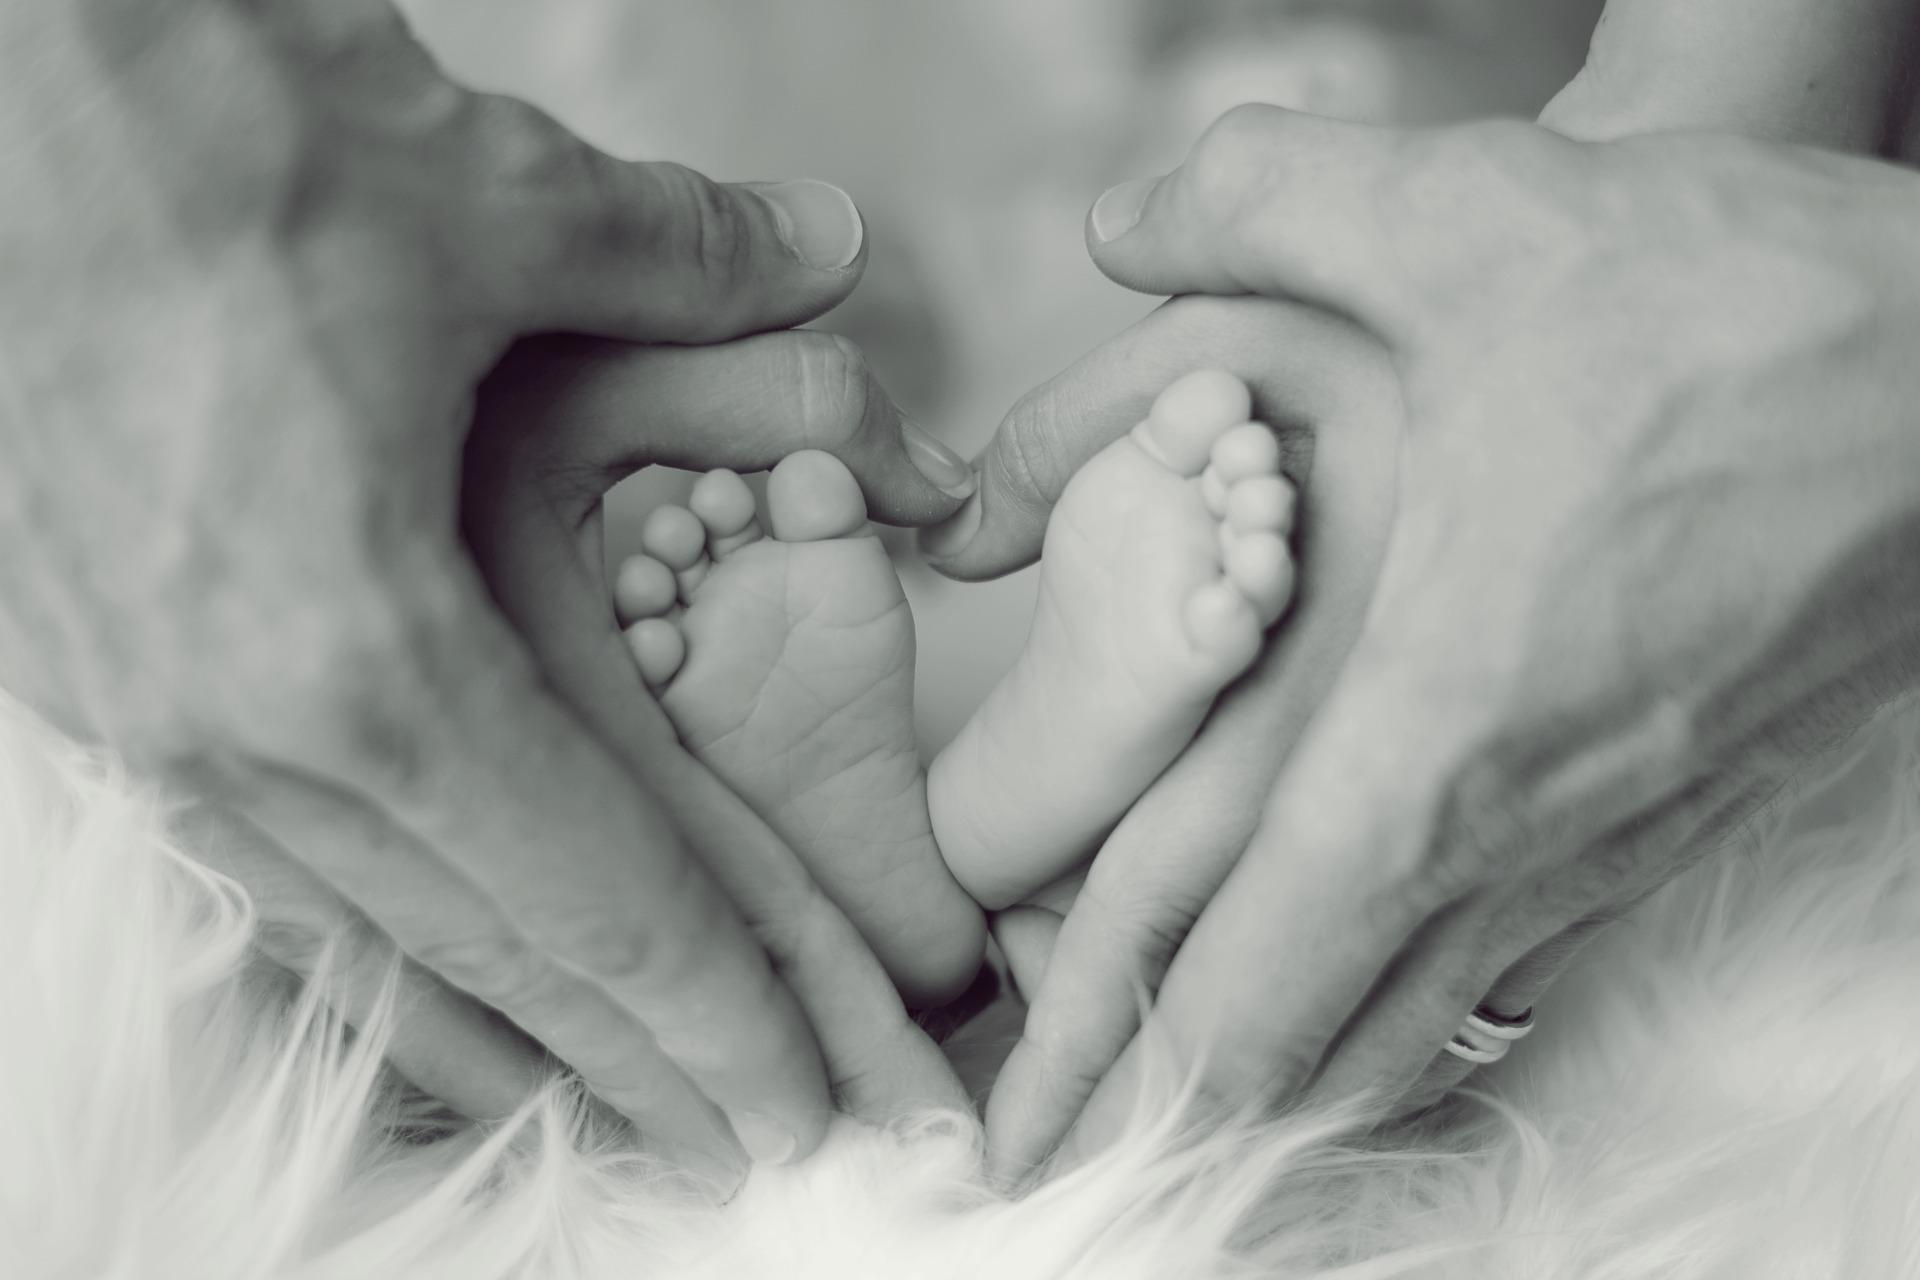 Opleiding bevallingstrauma